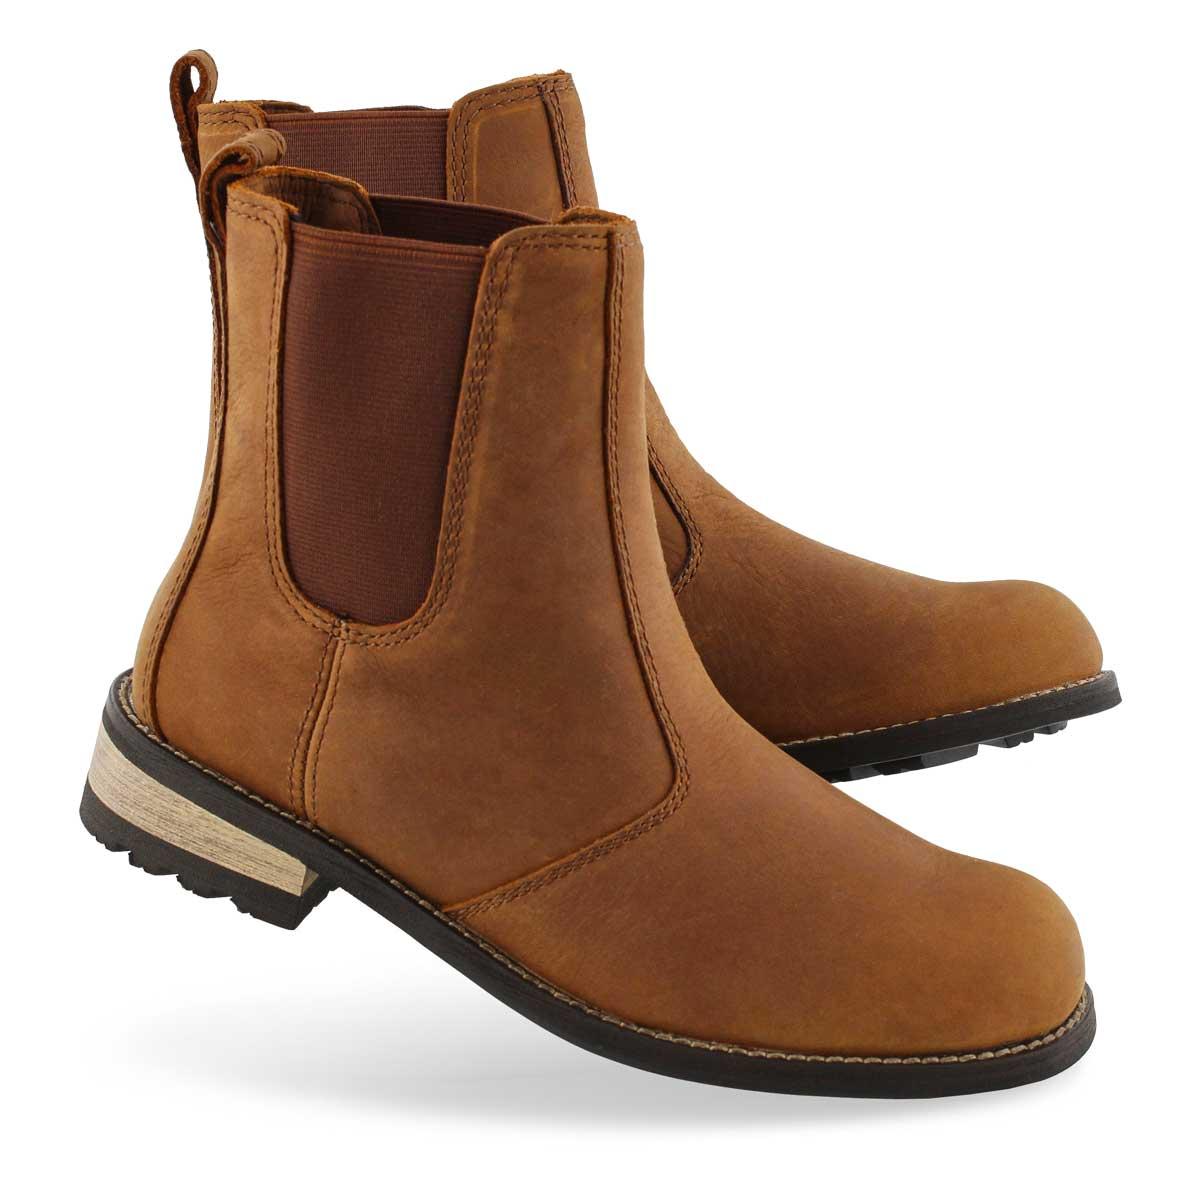 Lds Alma barley wtpf chelsea boot